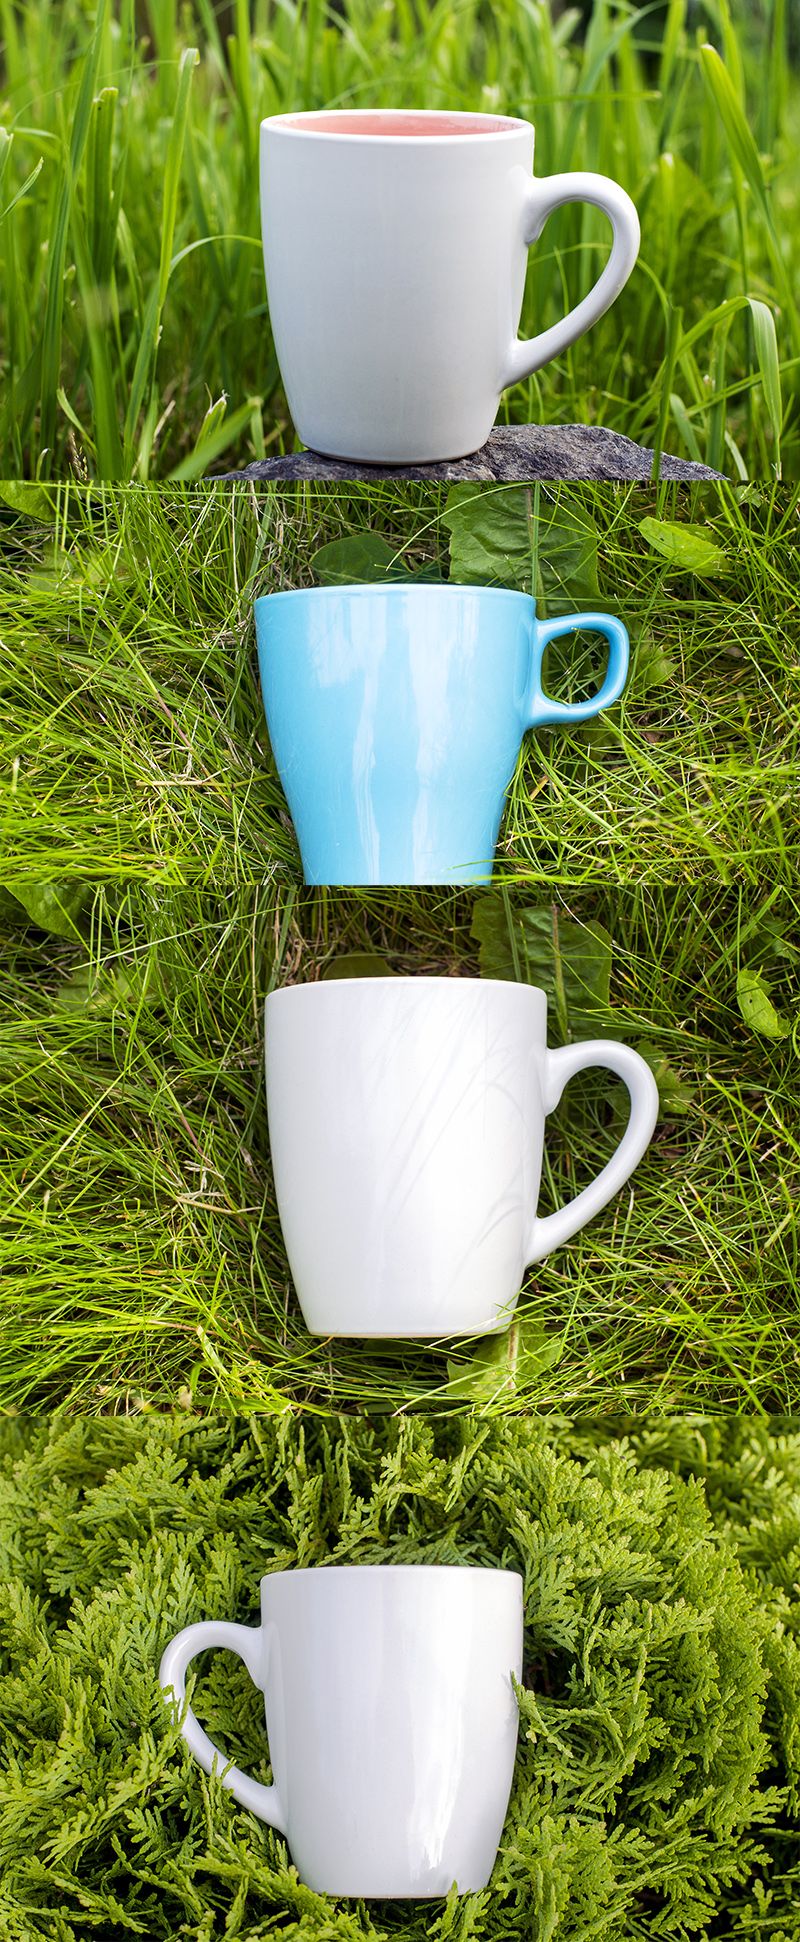 Light large mugs on a green lawn.